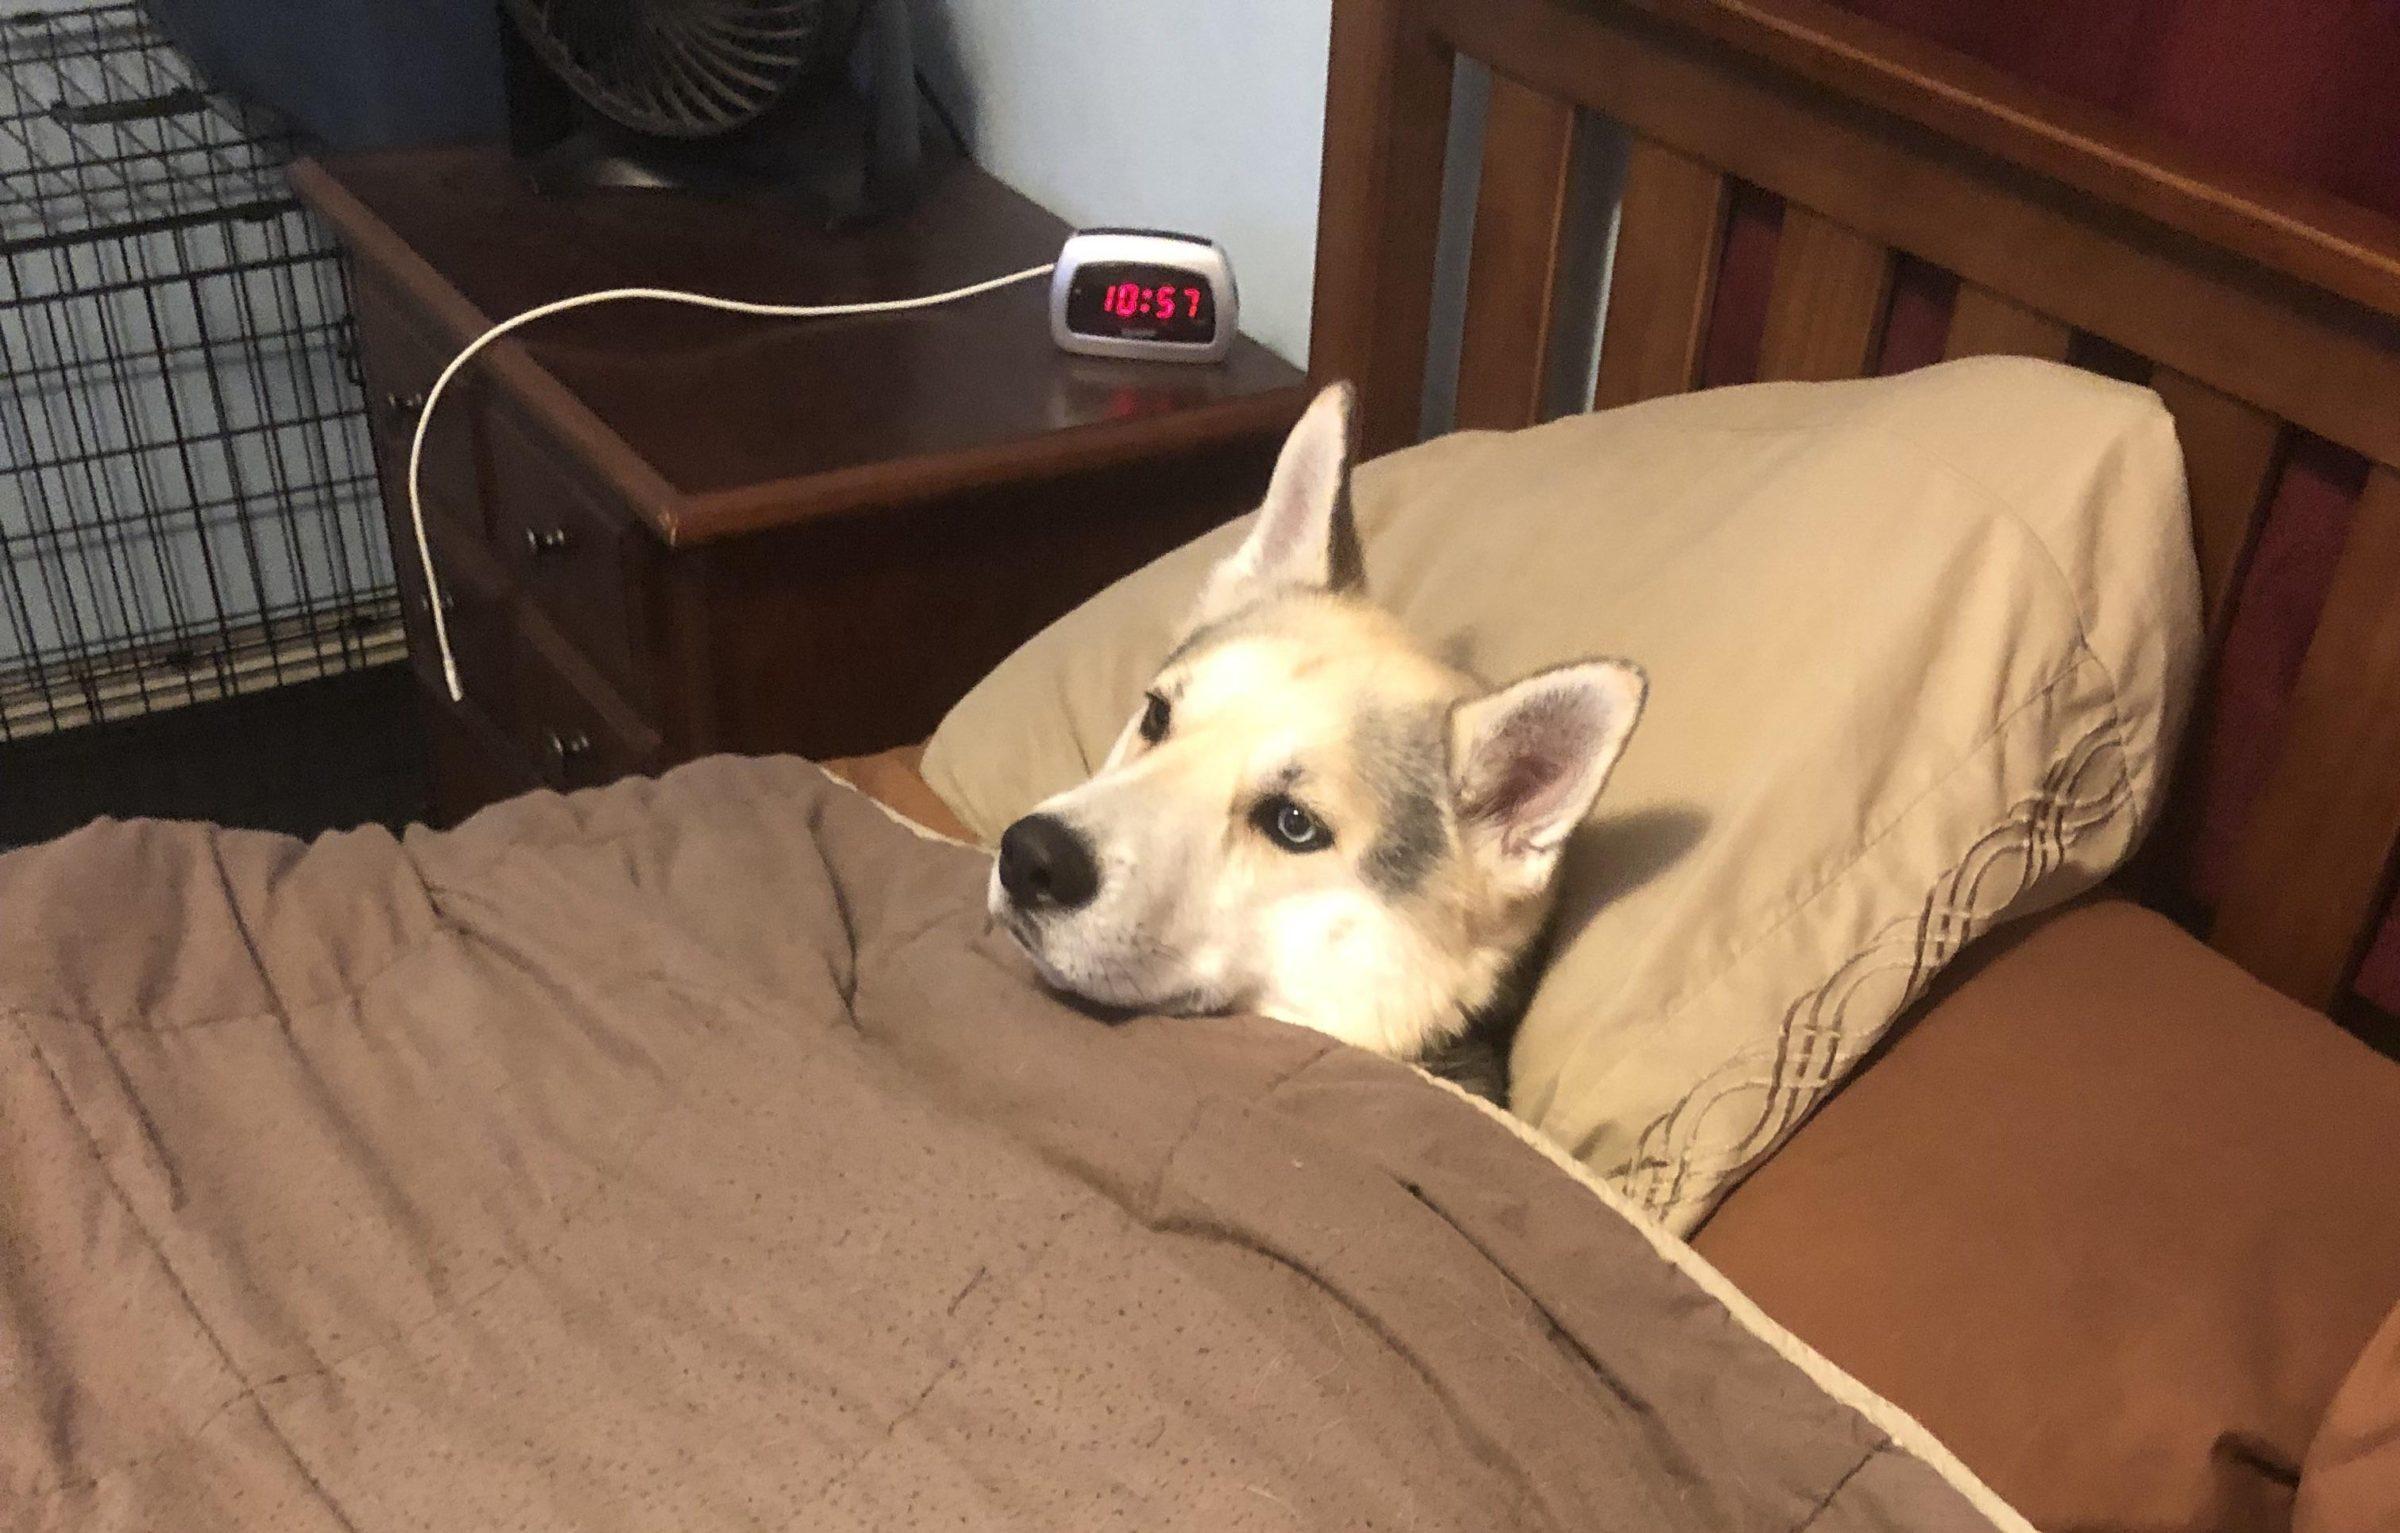 Dog awake in bed  meme template blank